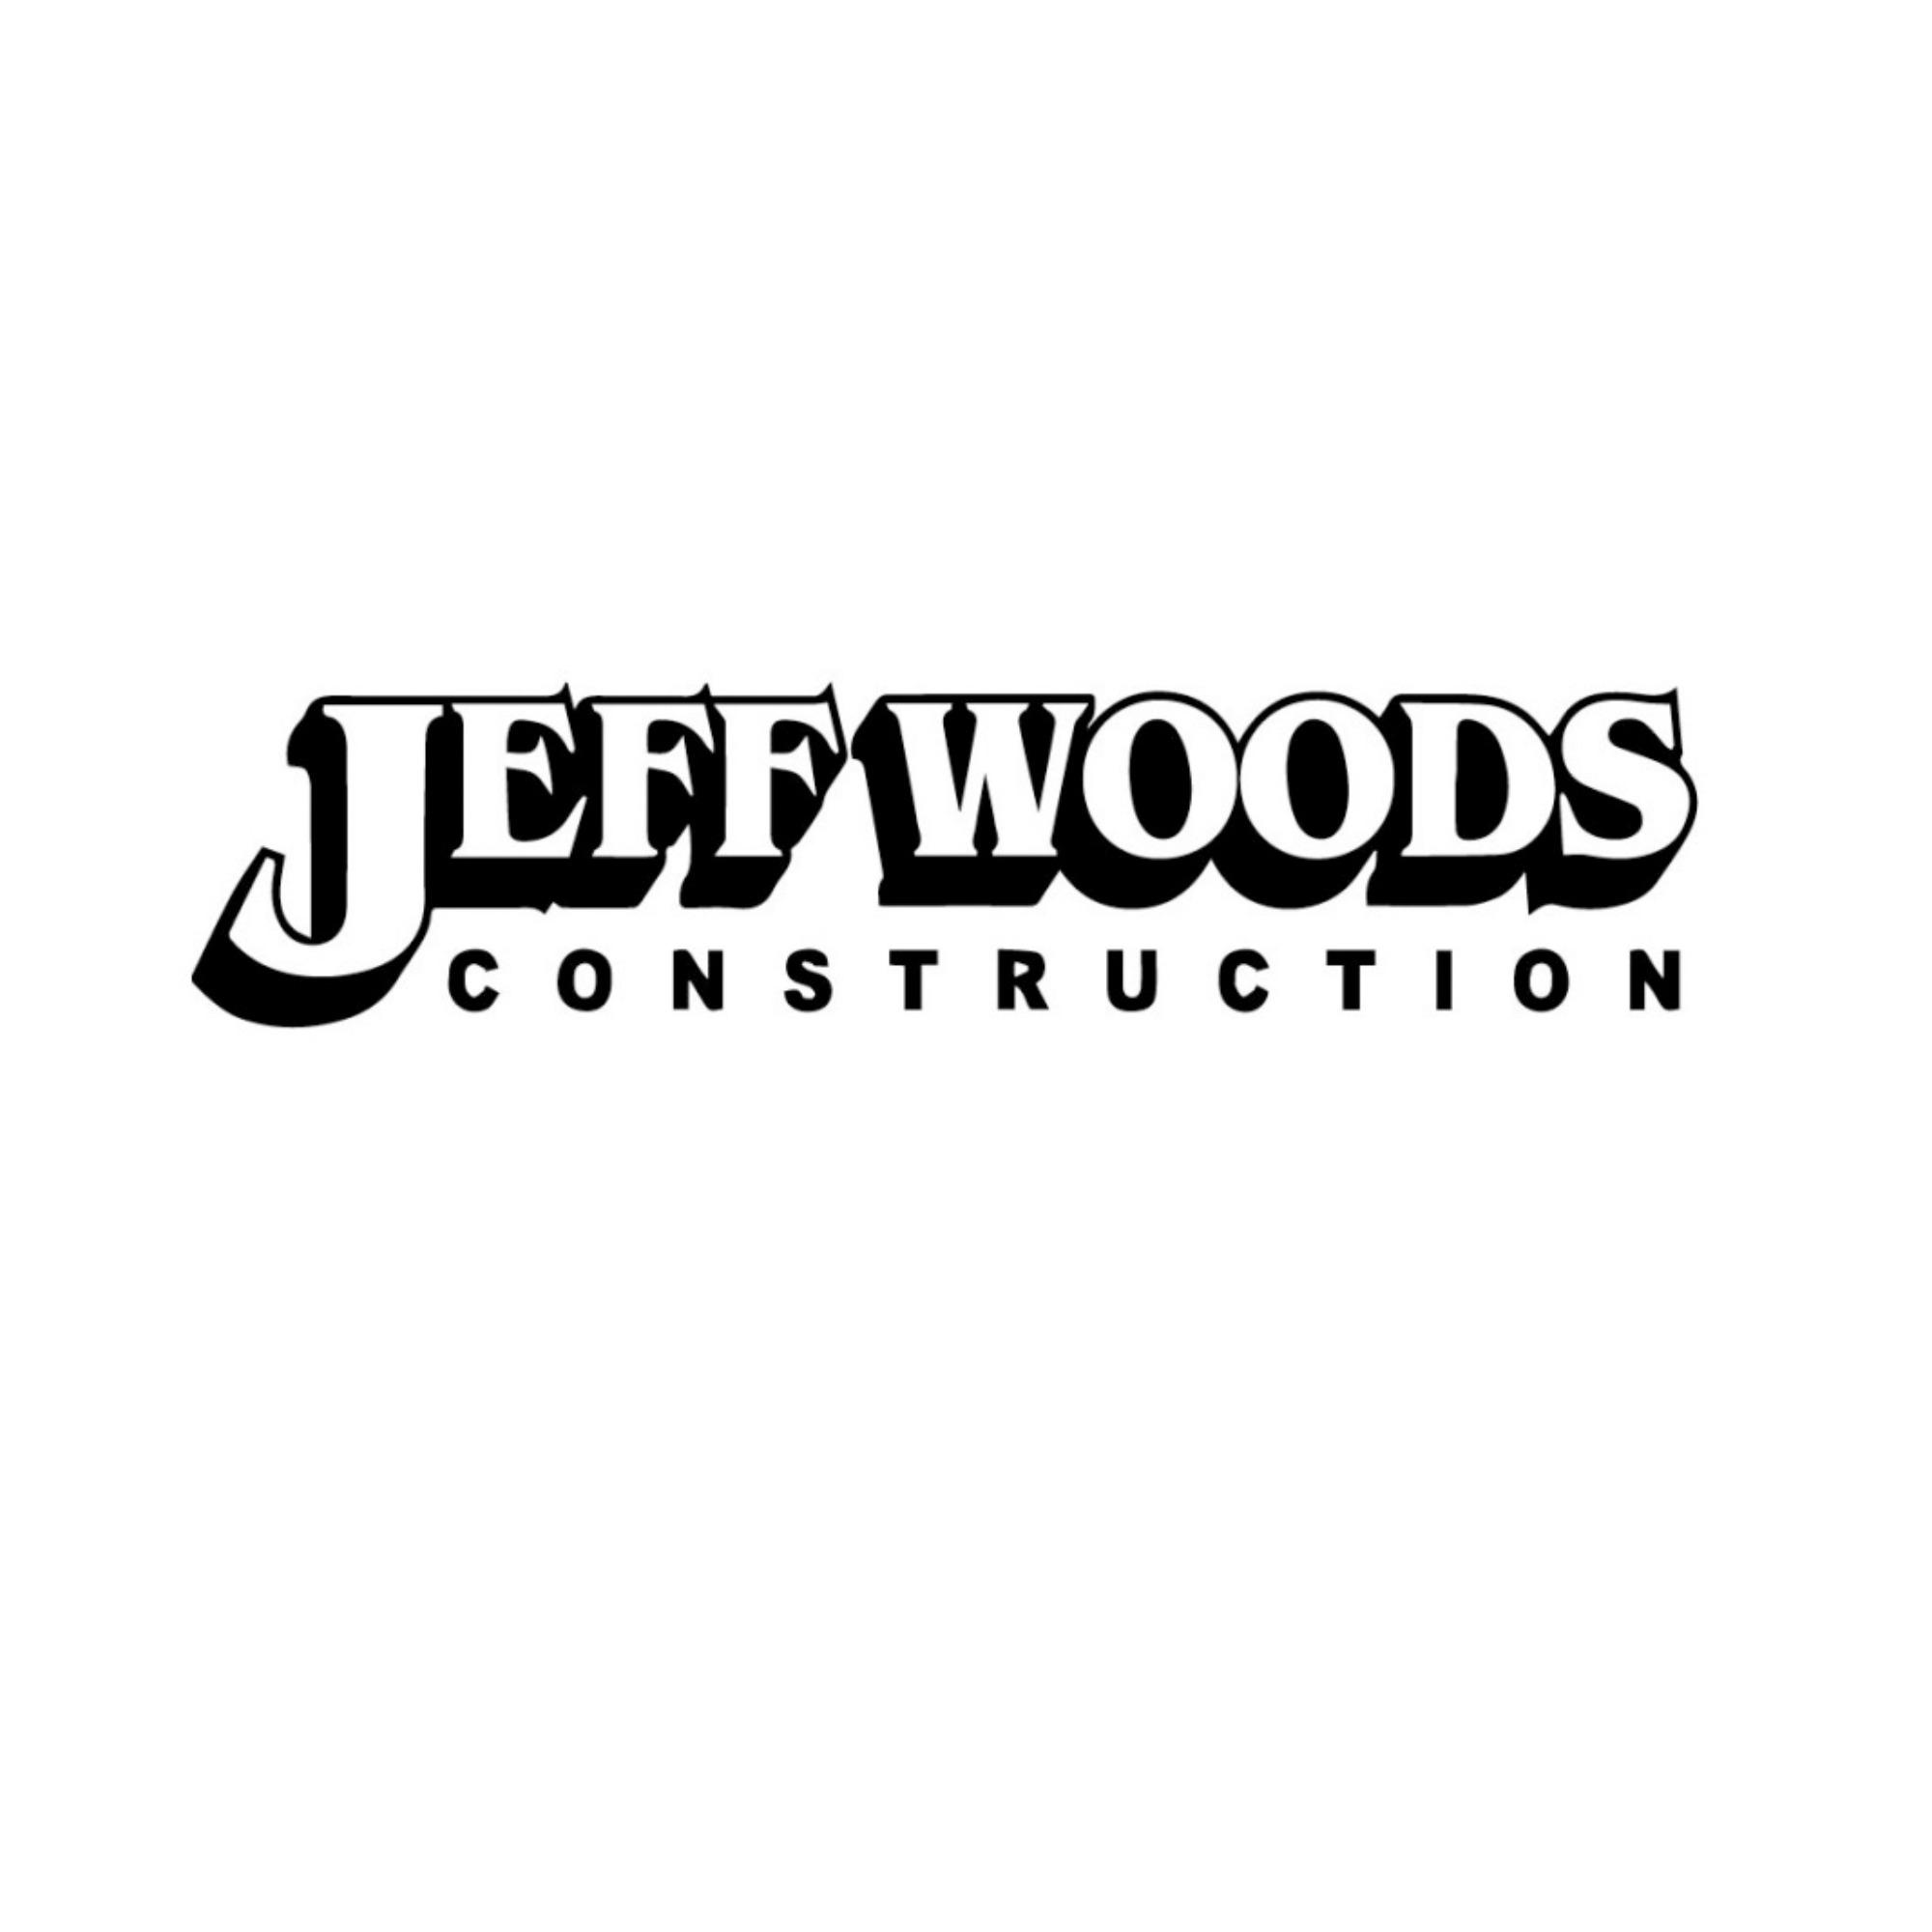 Jeff Woods Construction Logo